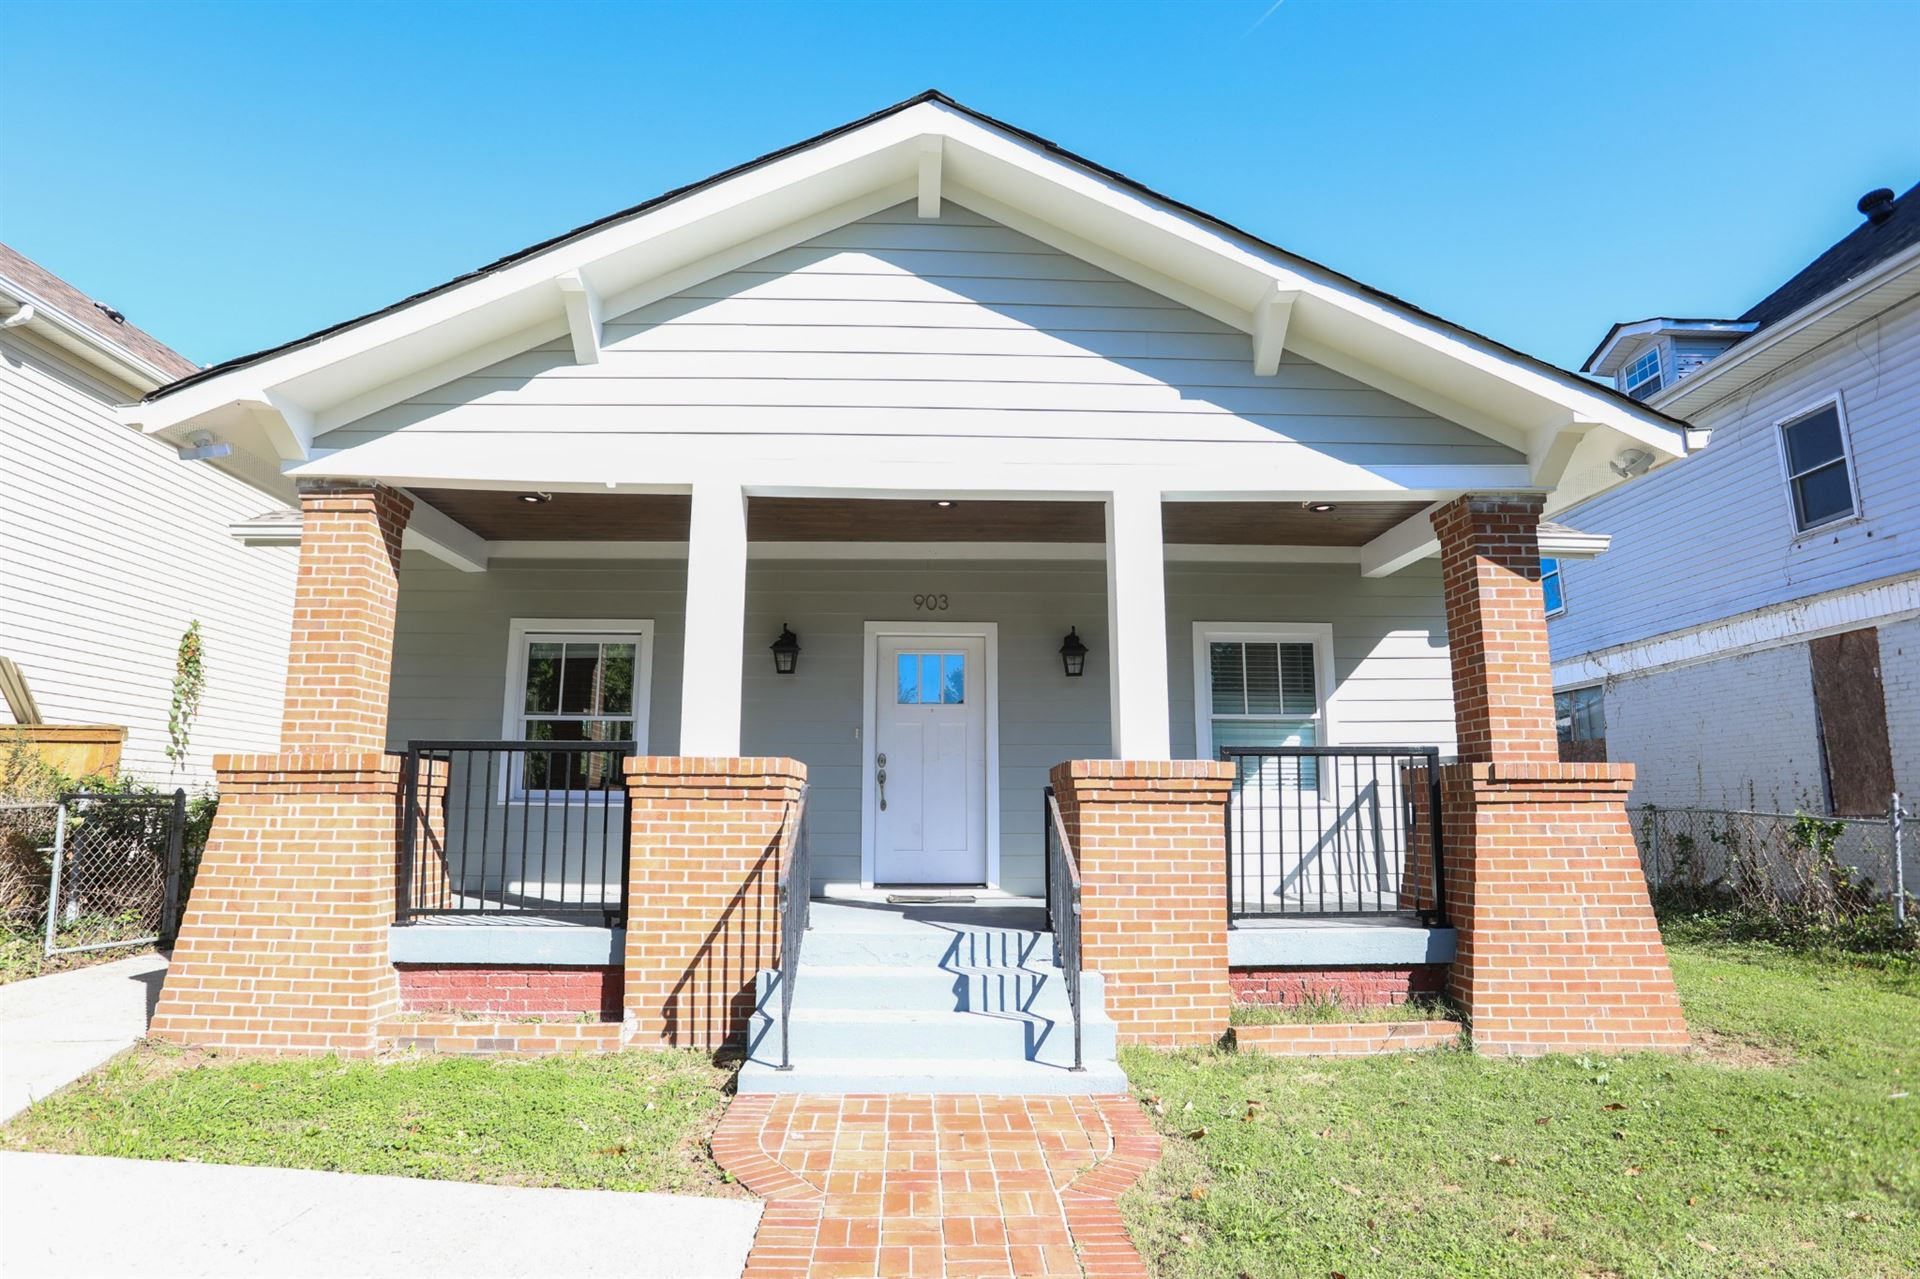 903 Chicamauga Ave, Nashville, TN 37206 - MLS#: 2301544